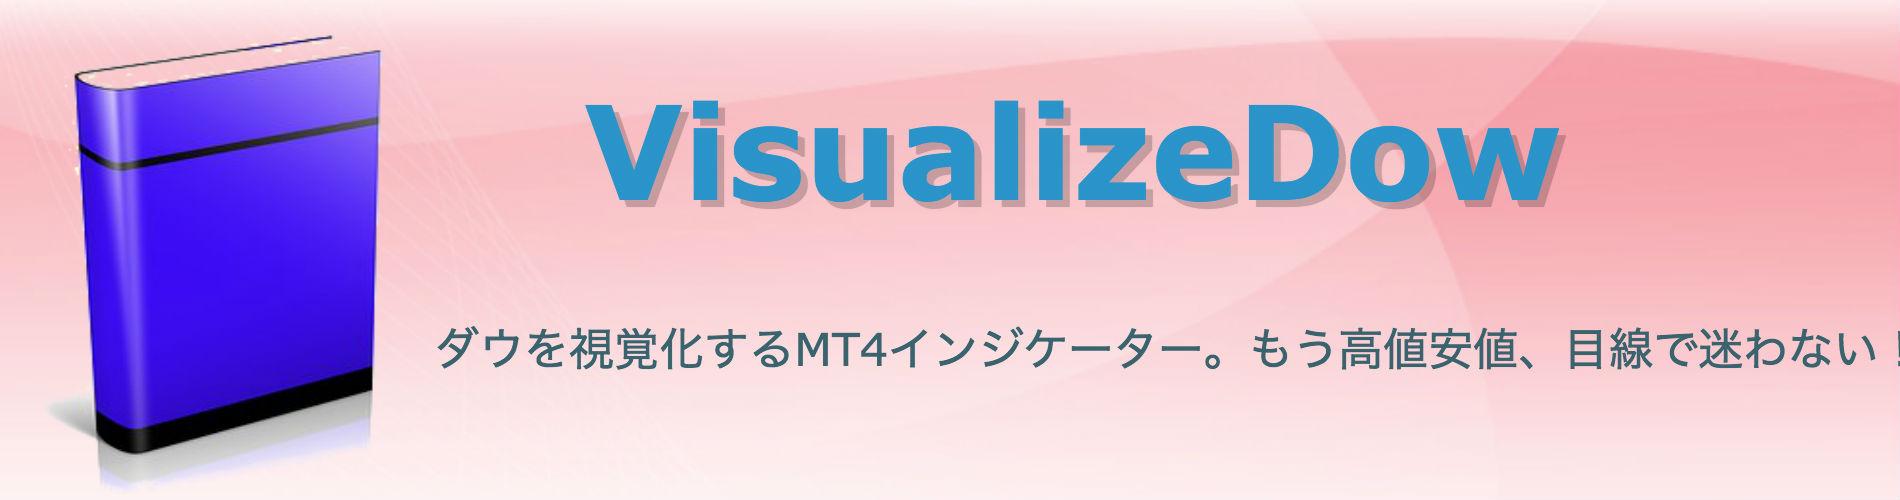 VisualizeDowスライドショー